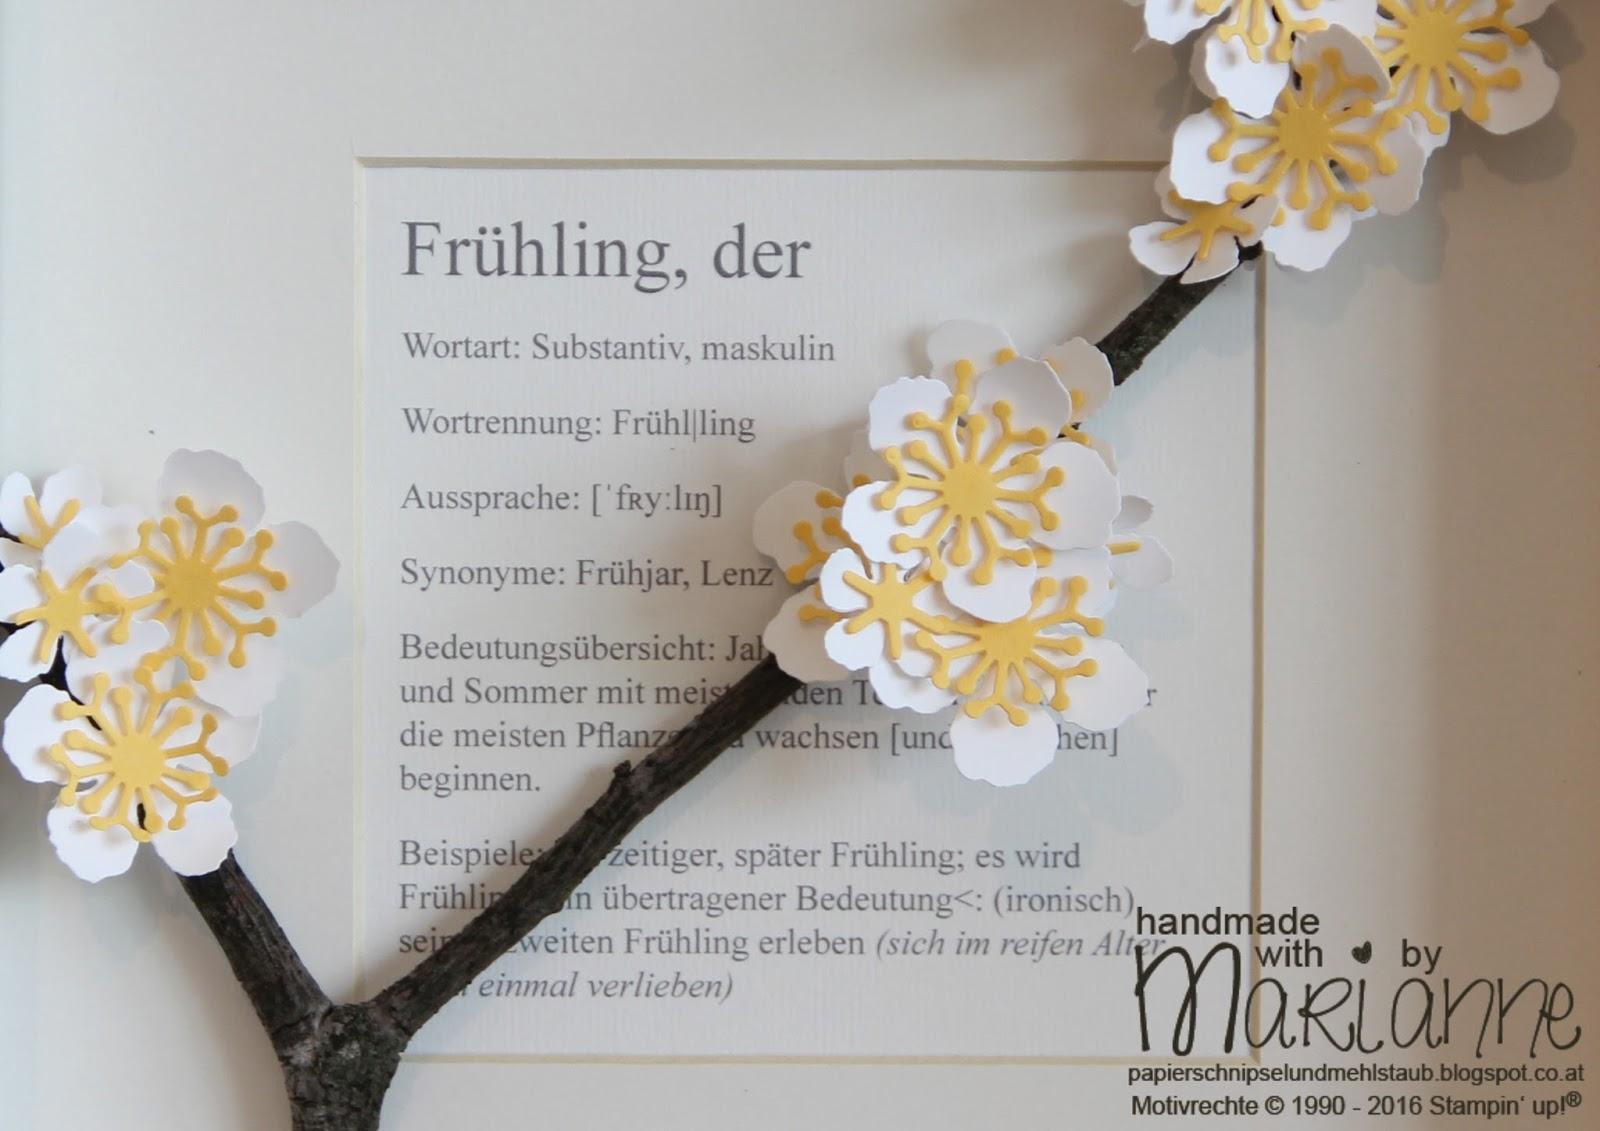 Papierschnipsel & Mehlstaub: Frühlingsgefühle